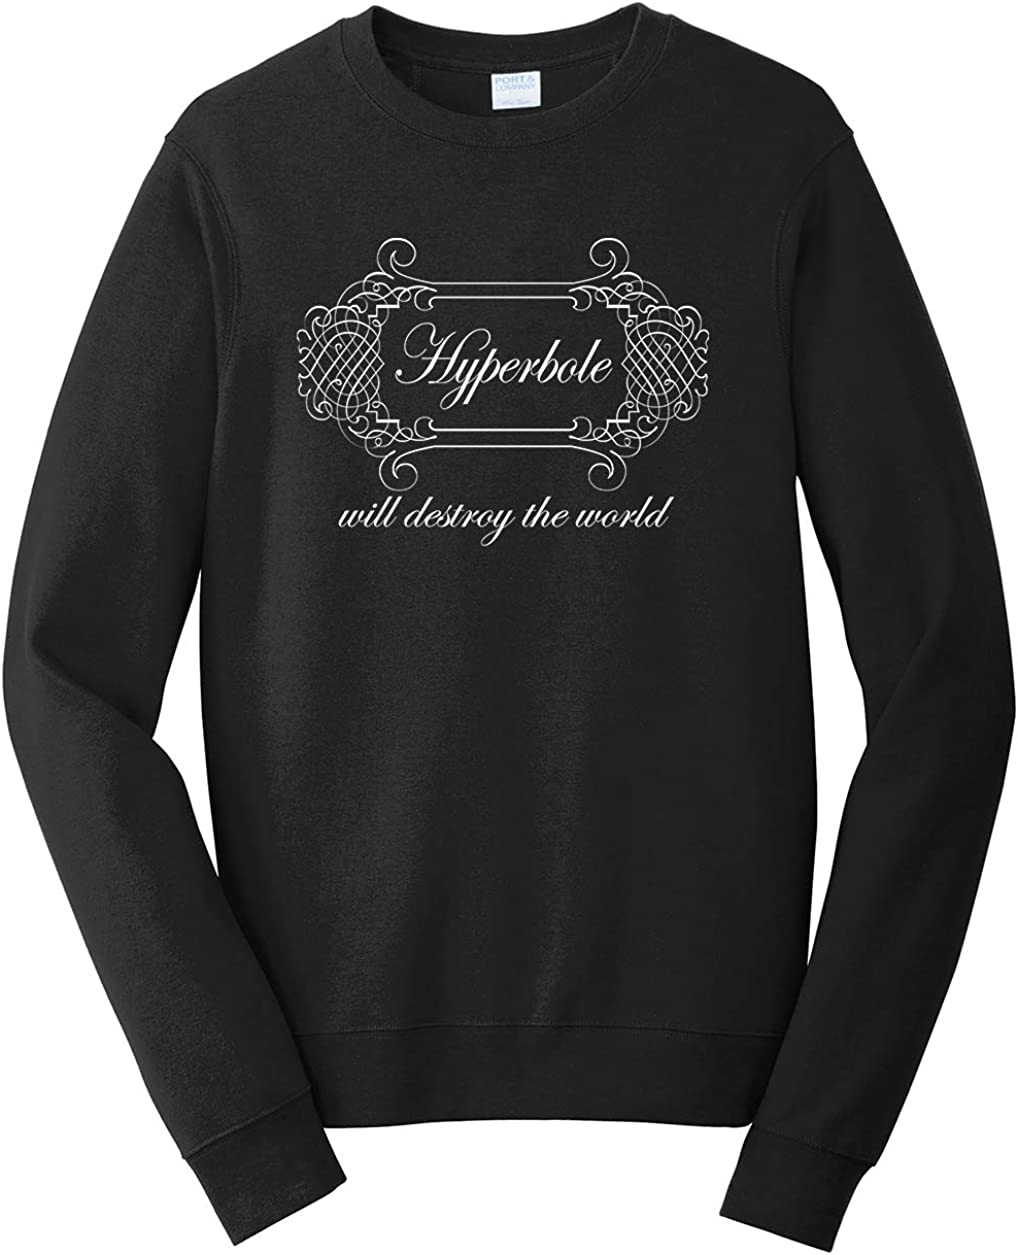 Tenacitee Unisex Hyperbole Will Destroy The World Sweatshirt